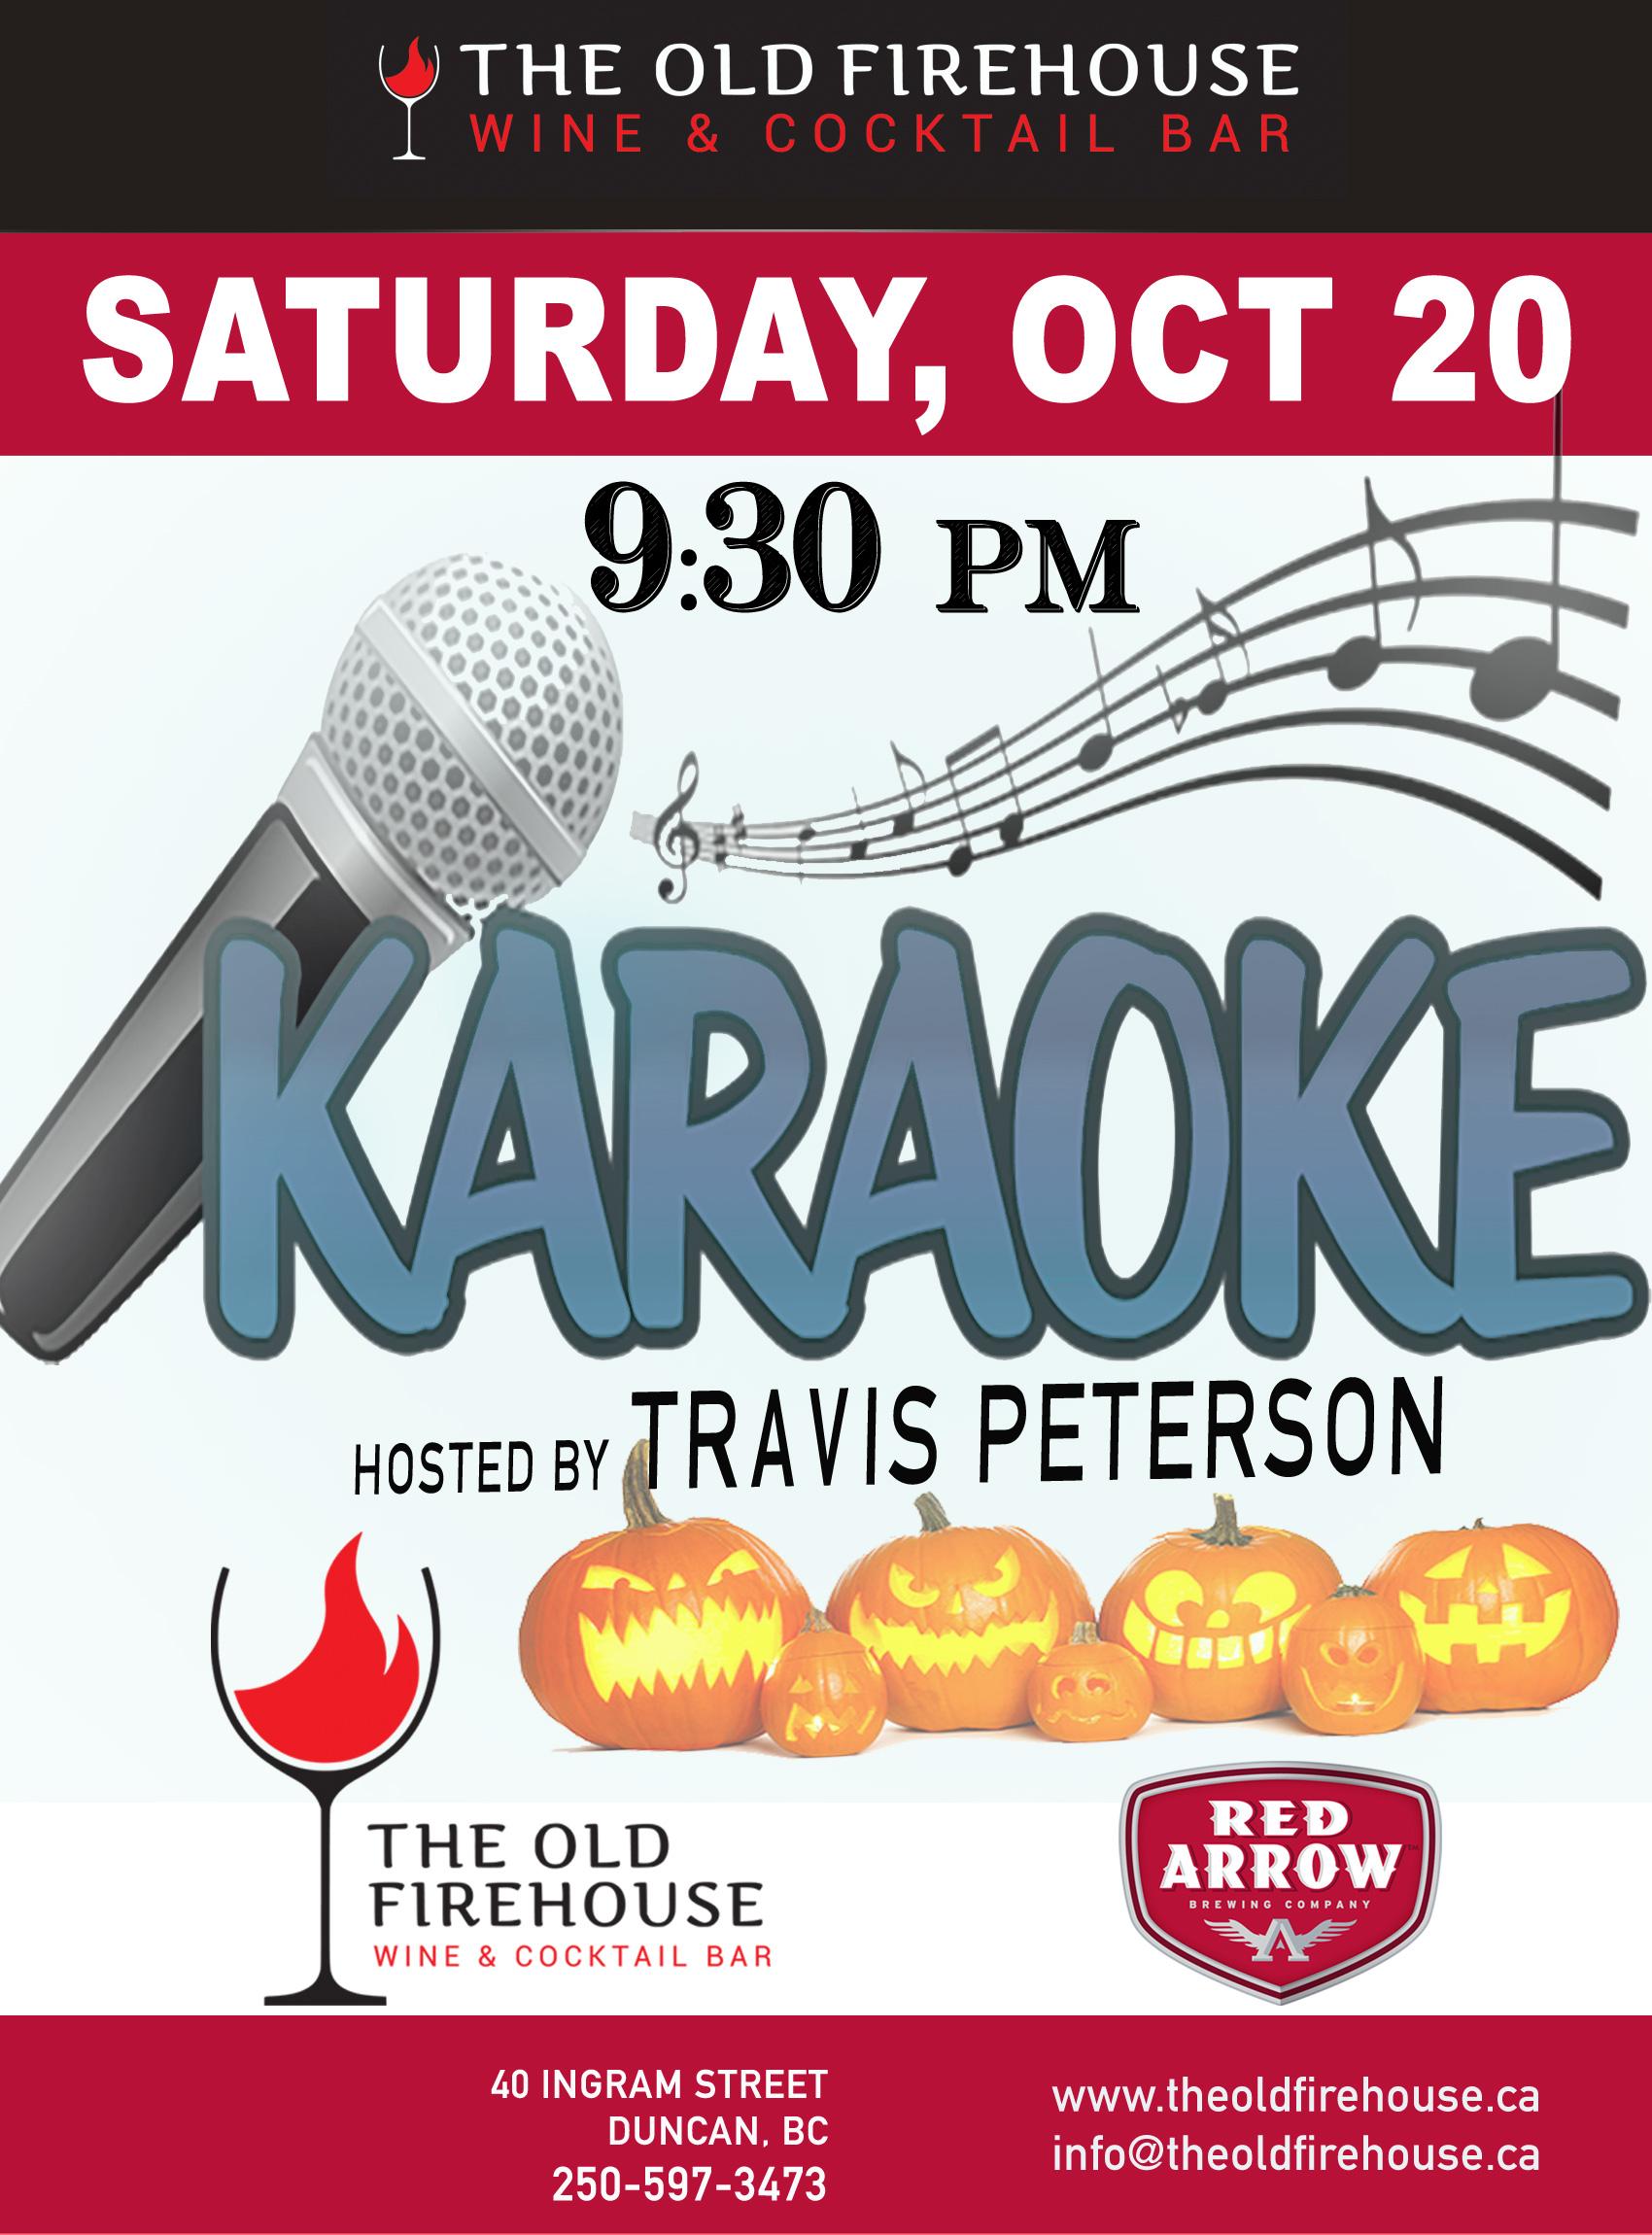 karaoke-poster-red-arrow-oct-20.jpg